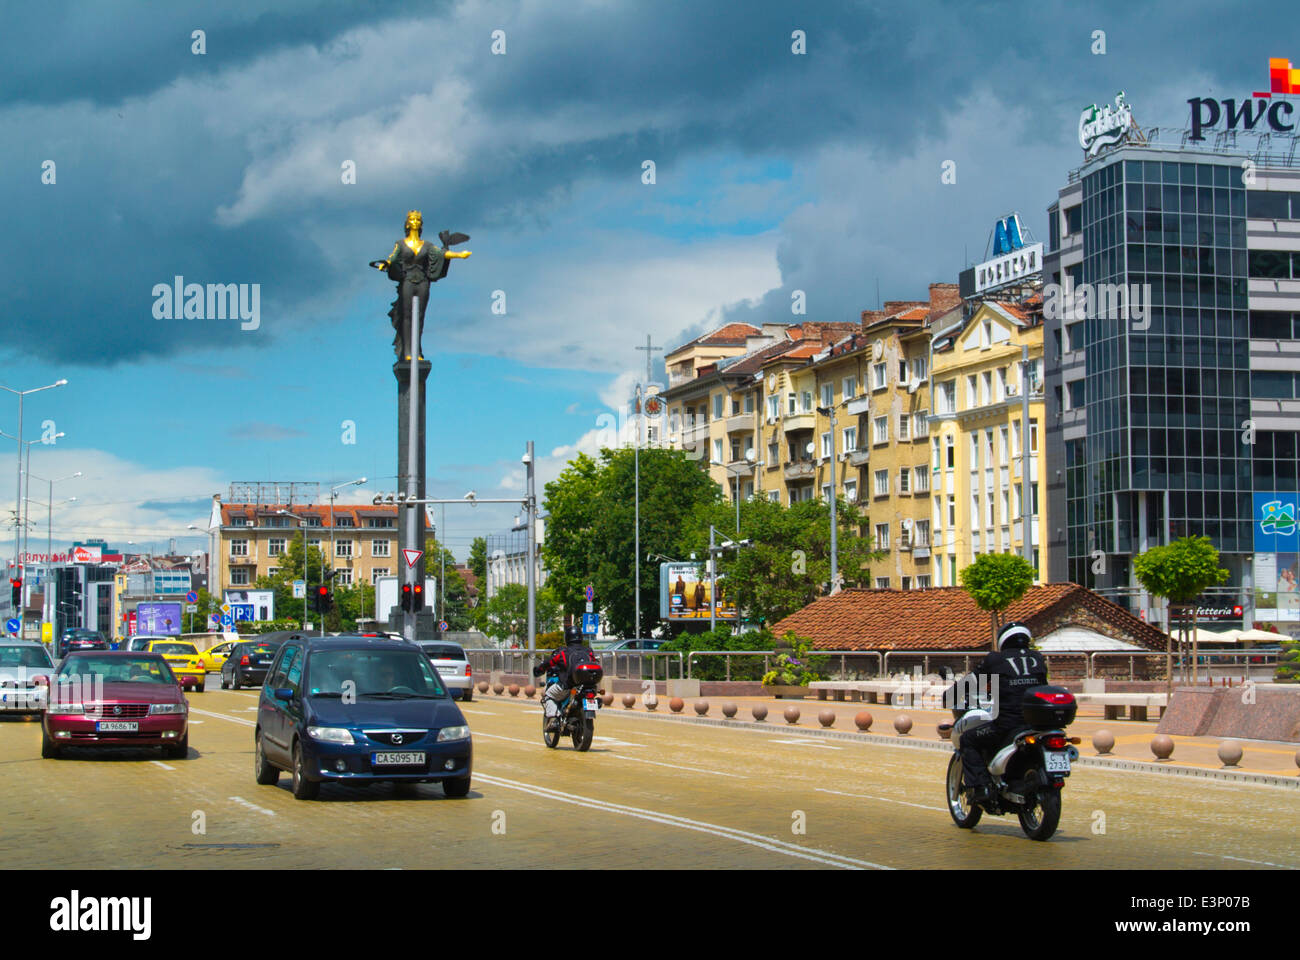 Traffic in Nezavisimost square, with Saint Sofia statue in background, central Sofia, Bulgaria, Europe Stock Photo